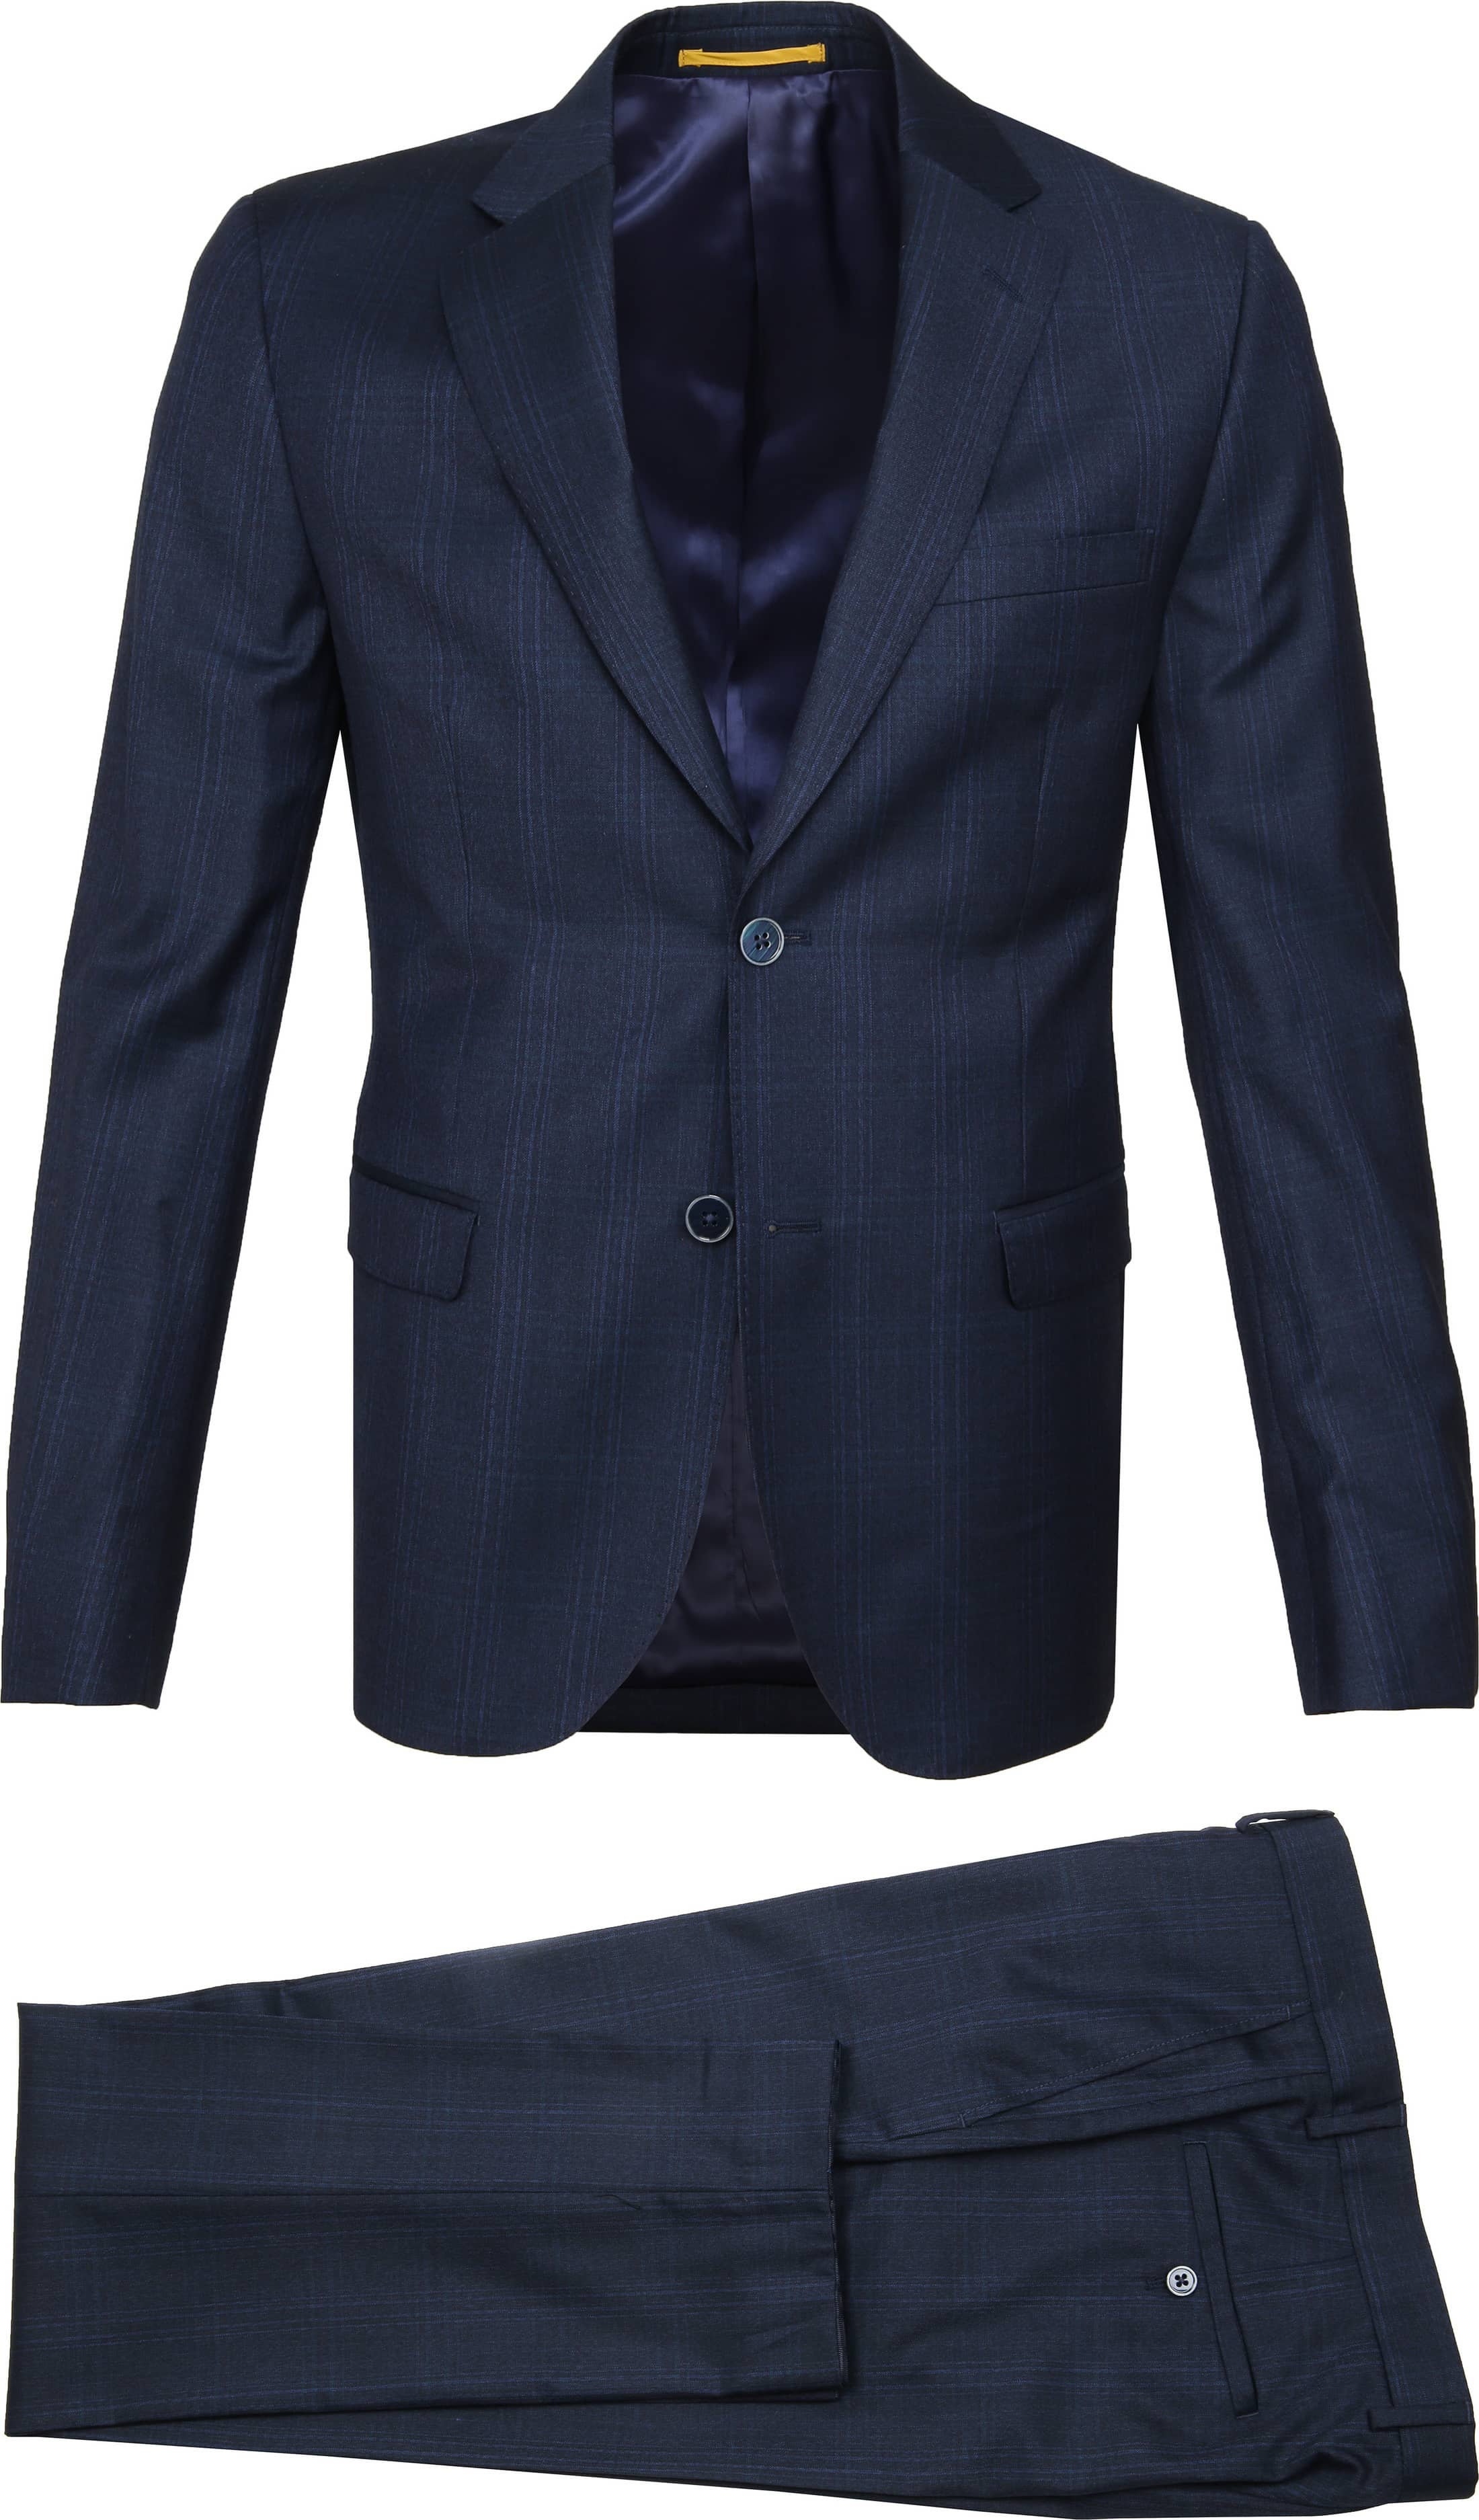 Suitable Strato Anzug Dunkelblau Fenster foto 1